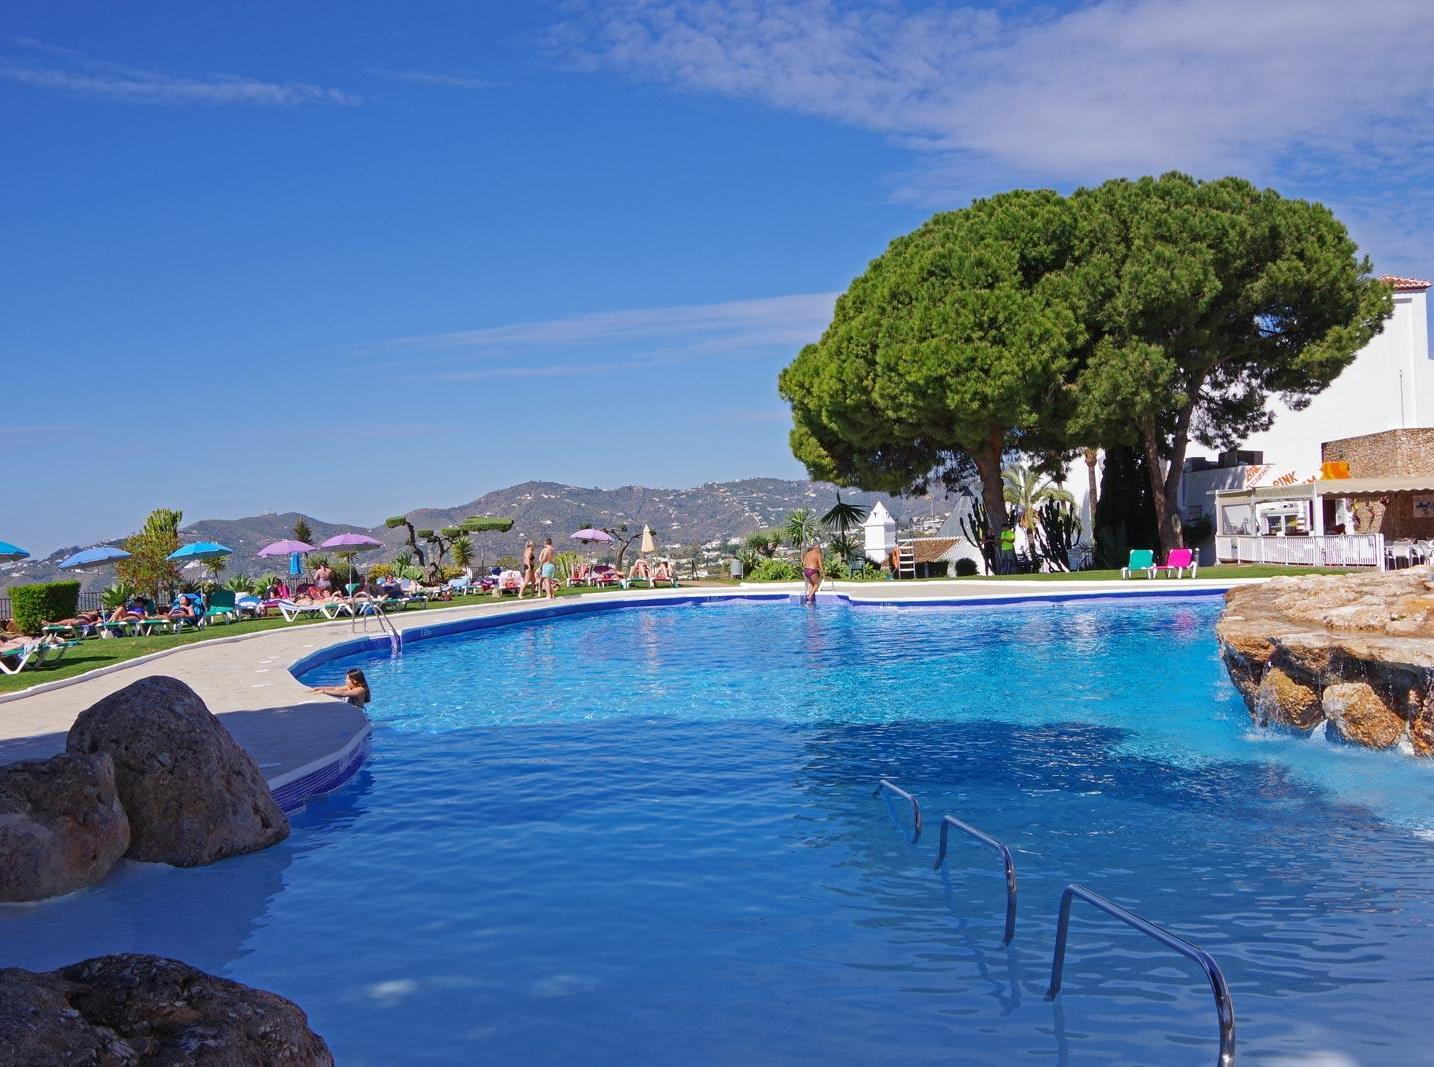 San Juan de Capistrano Nerja pool